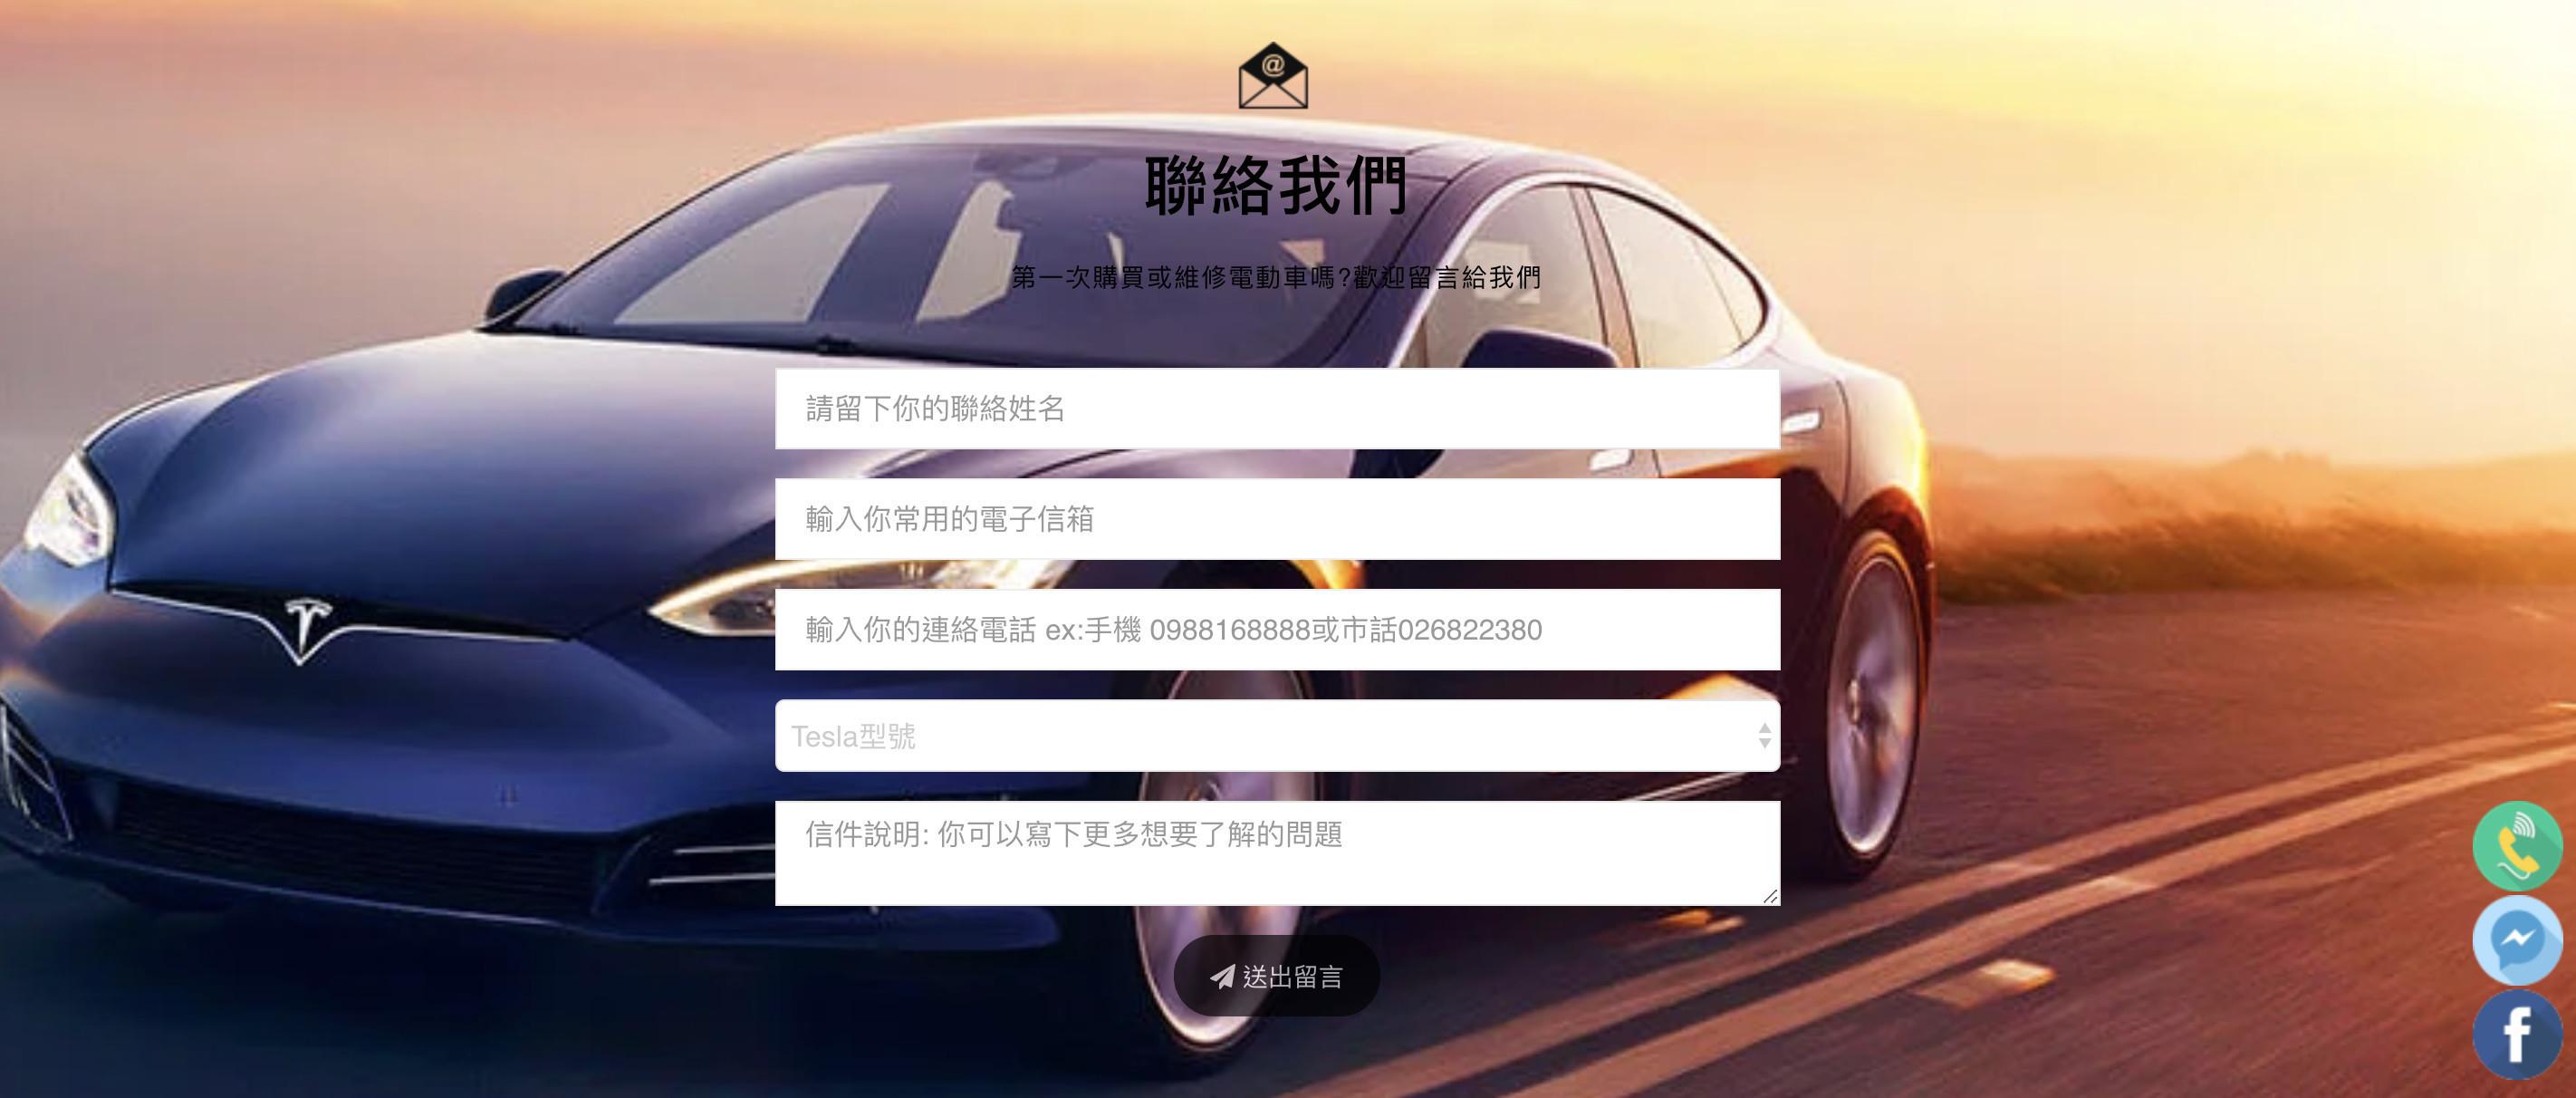 TEC-TESLA EQUIPMENT CENTER台灣電動車保養改裝廠  社群連結